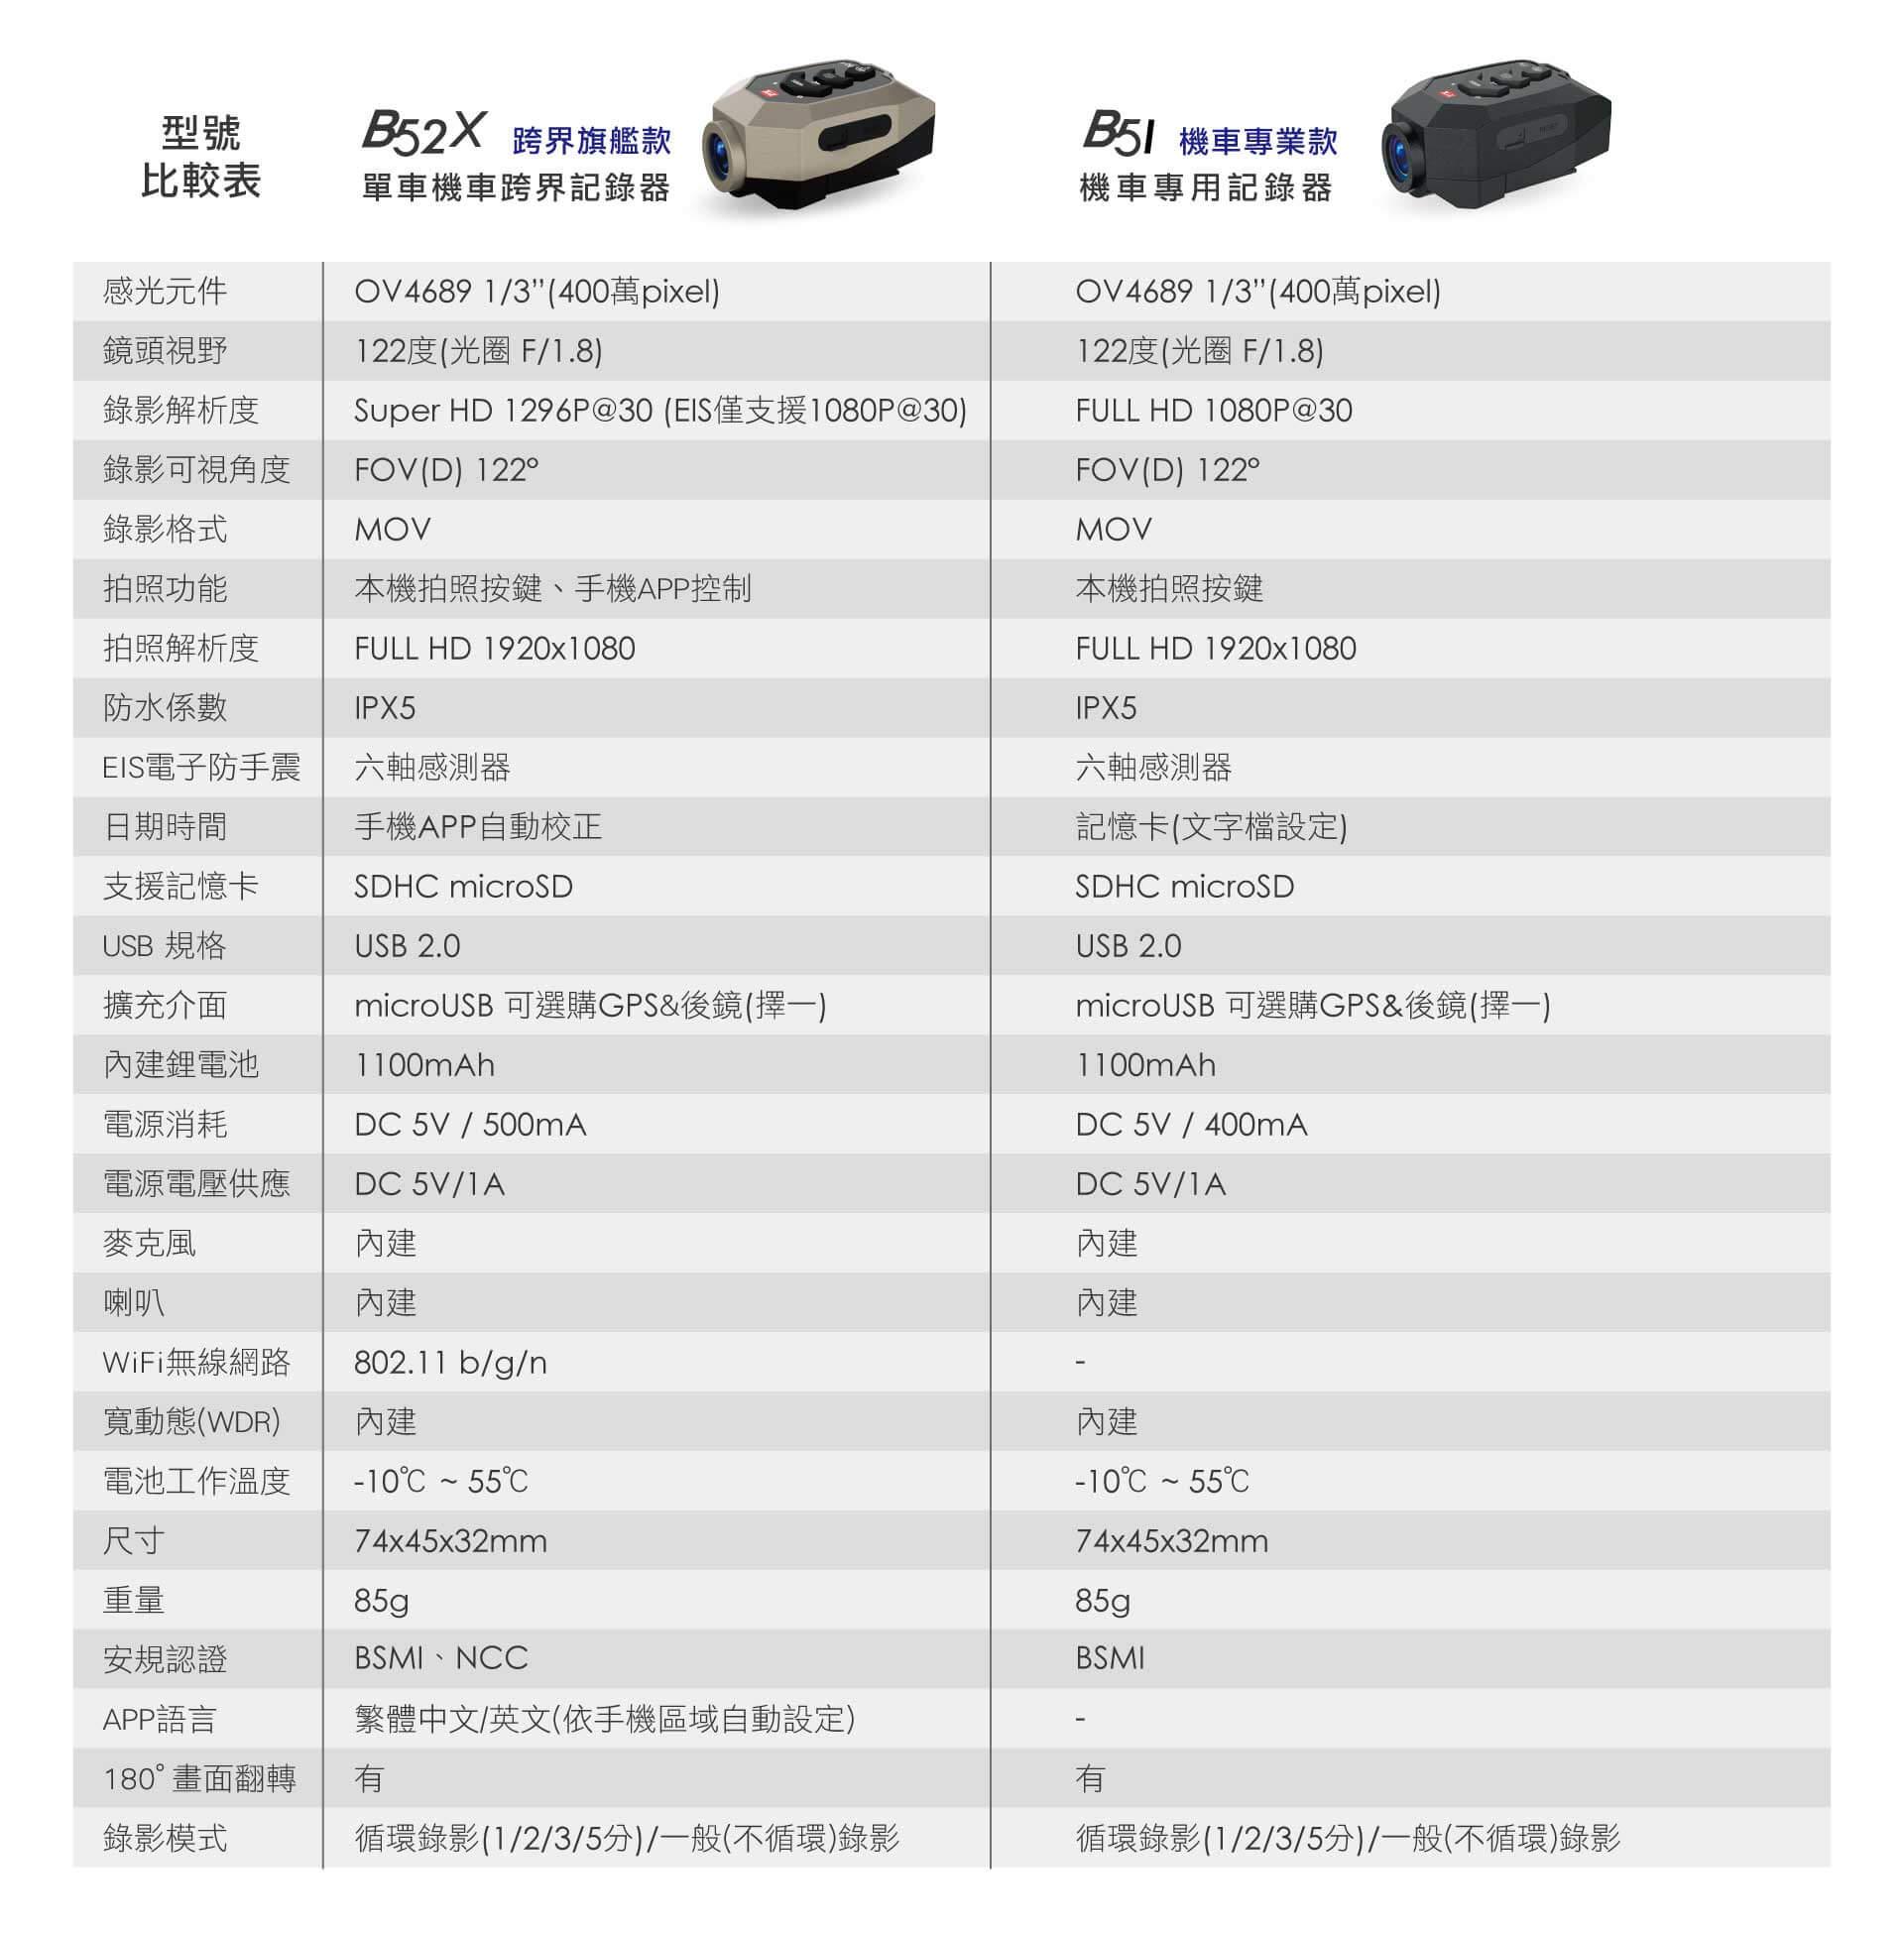 proimages/product/pro-01/pro-01-002/B52X/B52X-25.jpg